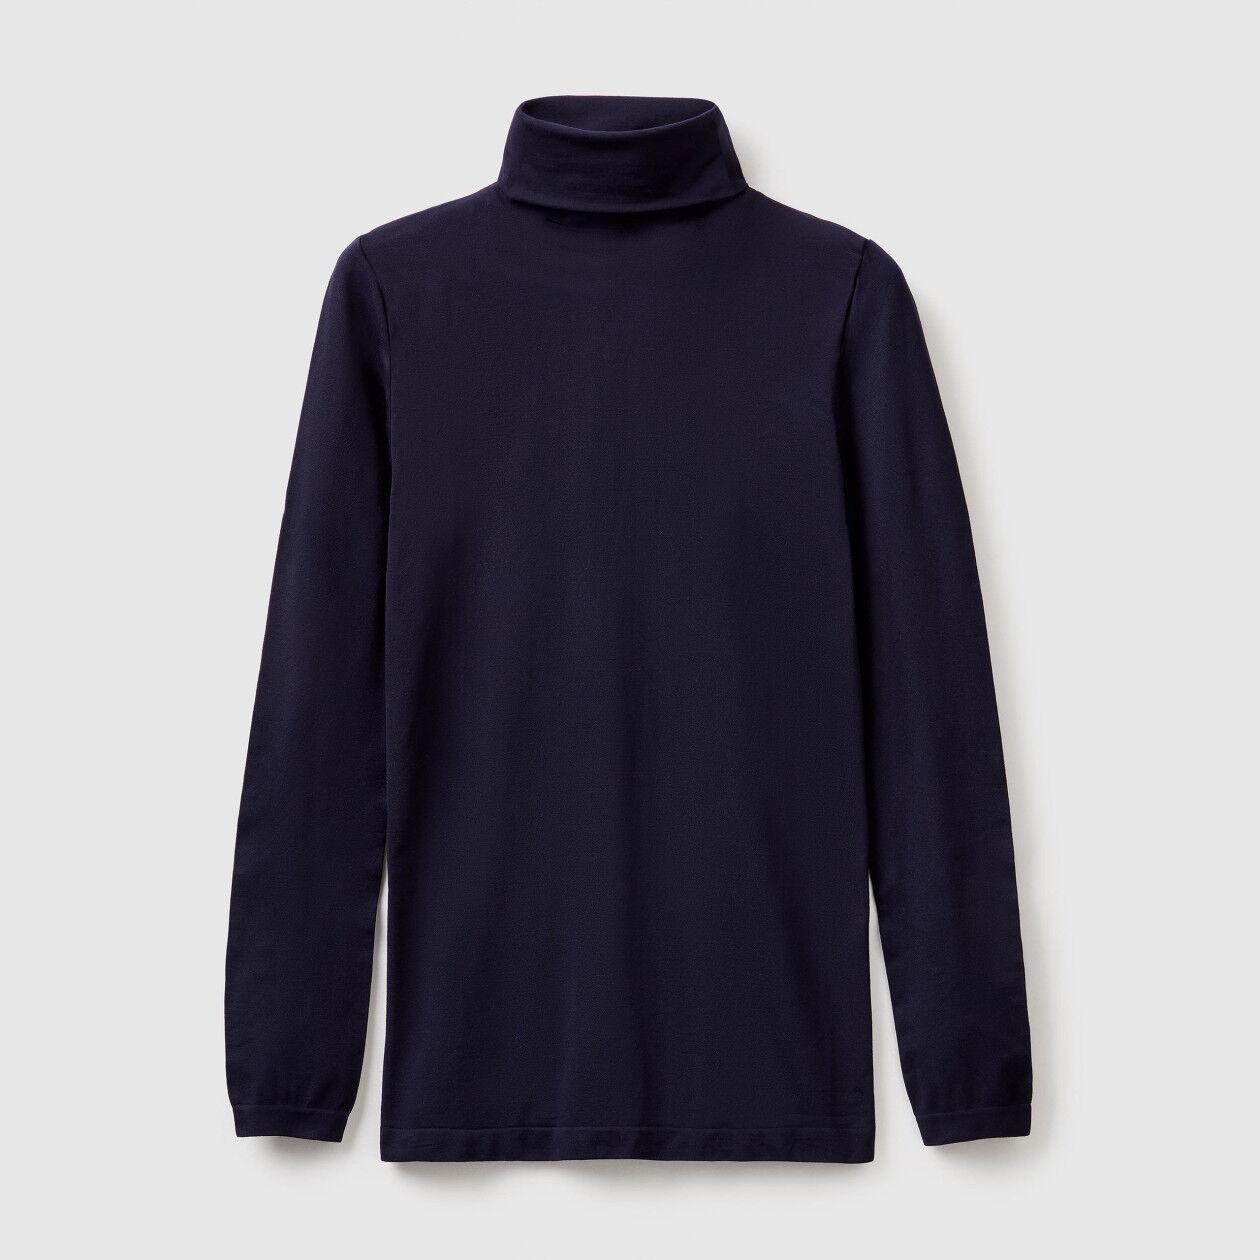 Stretch turtleneck sweater